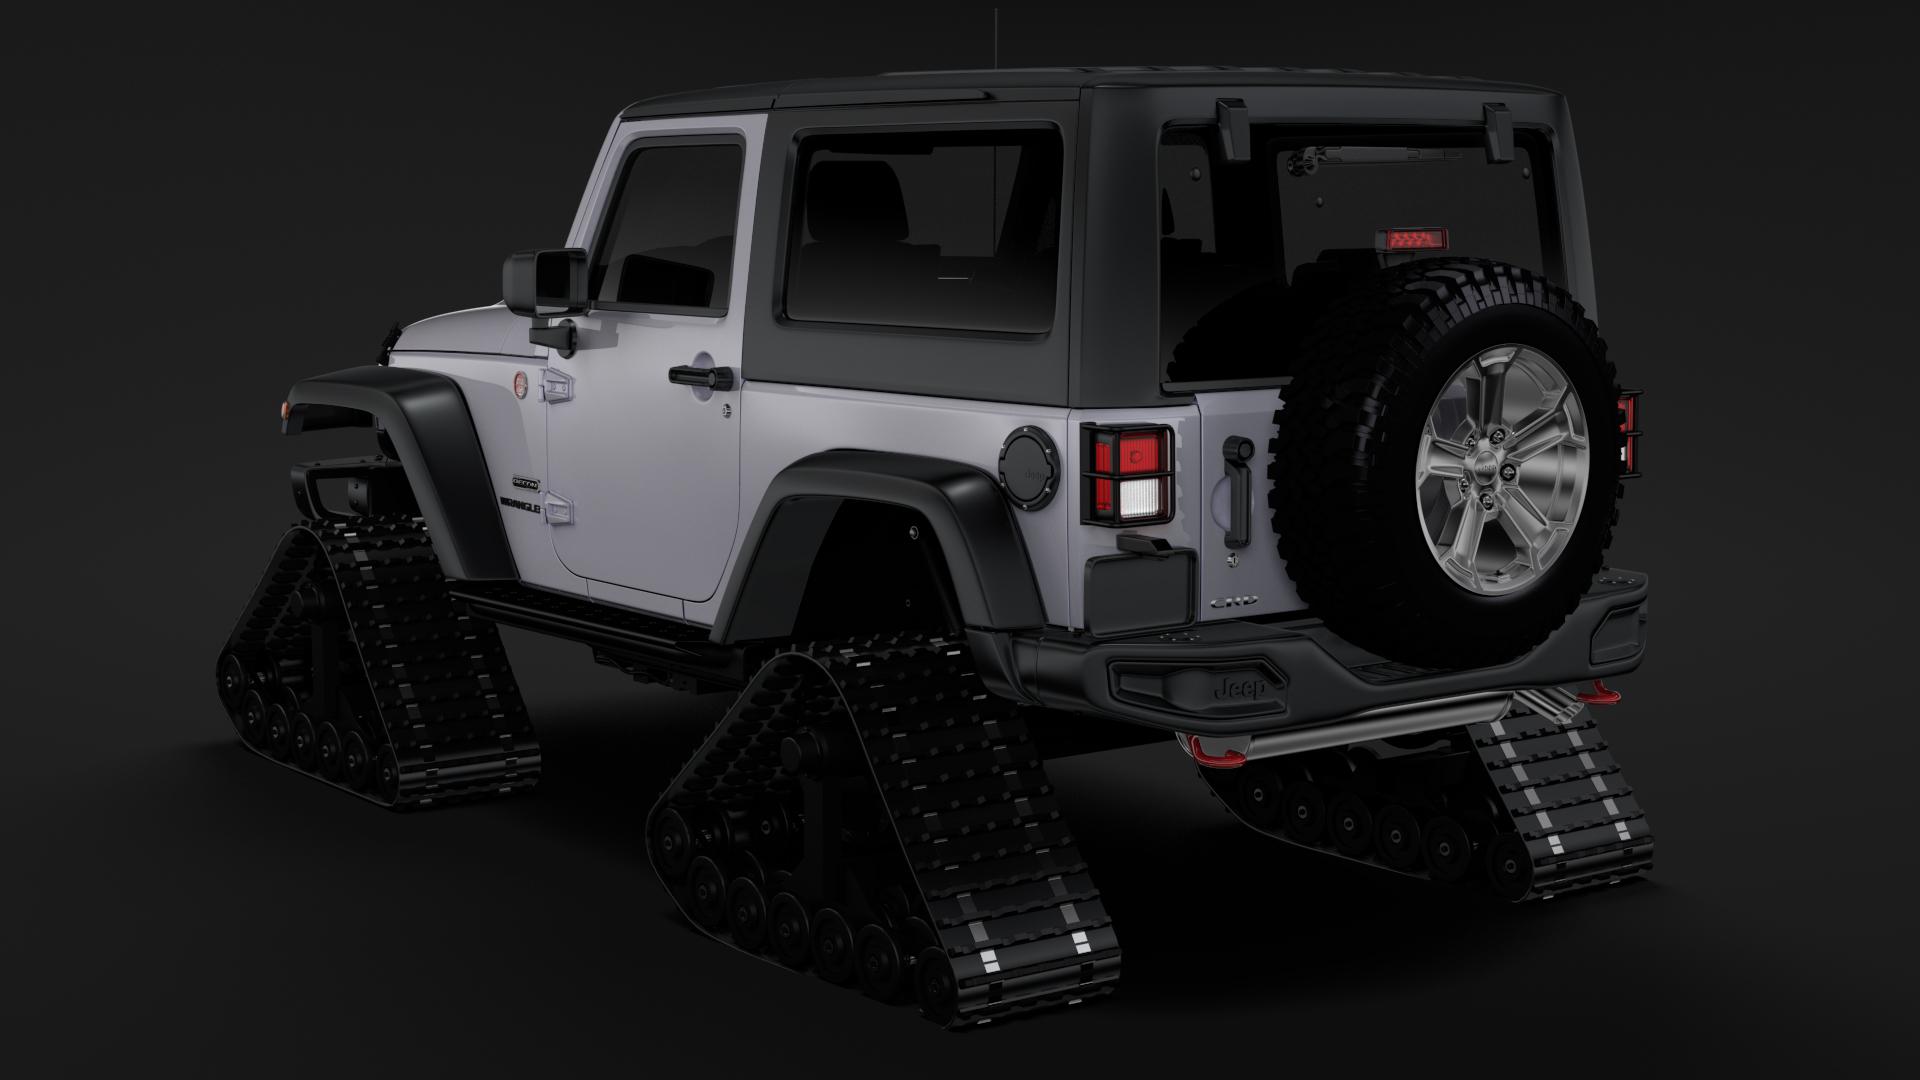 jeep wrangler crawler rubicon recon jk 2017 3d model max fbx c4d lwo ma mb hrc xsi obj 276913